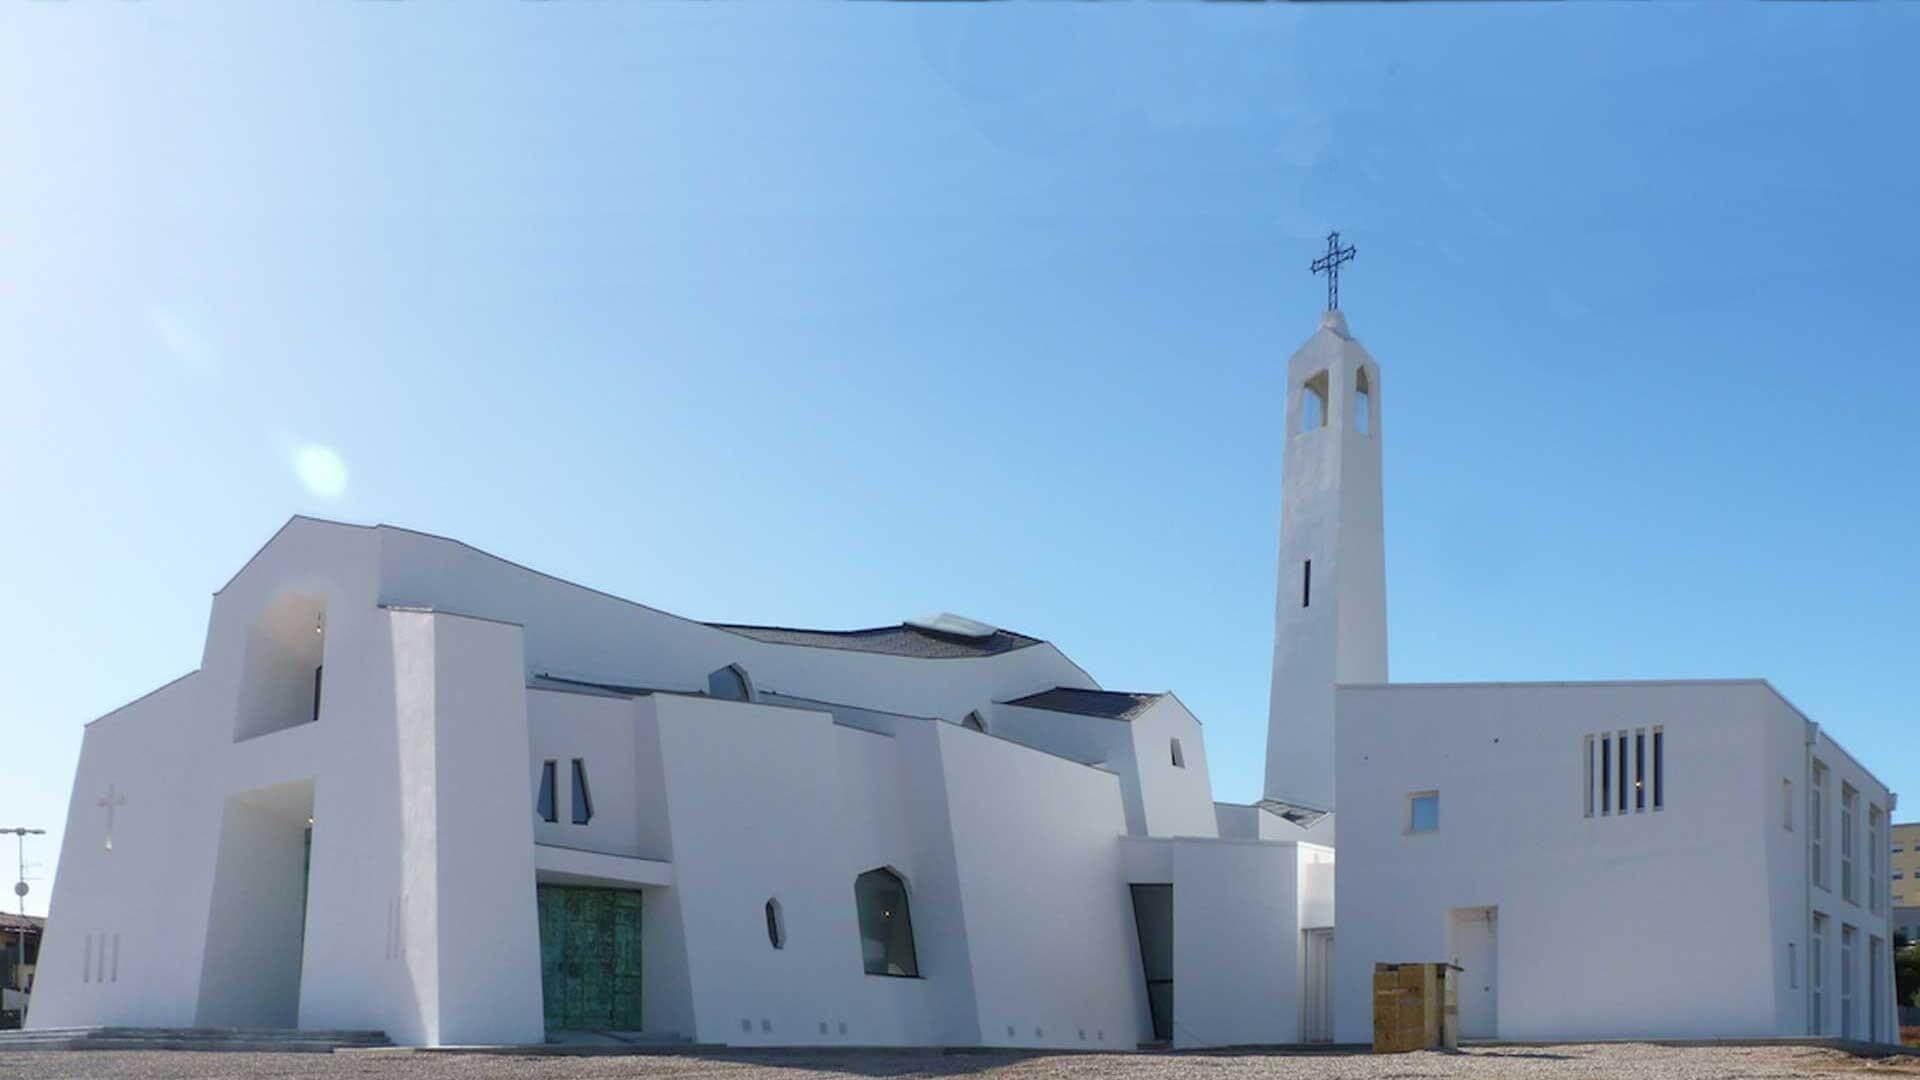 Chiesa San Michele Arcangelo Olbia